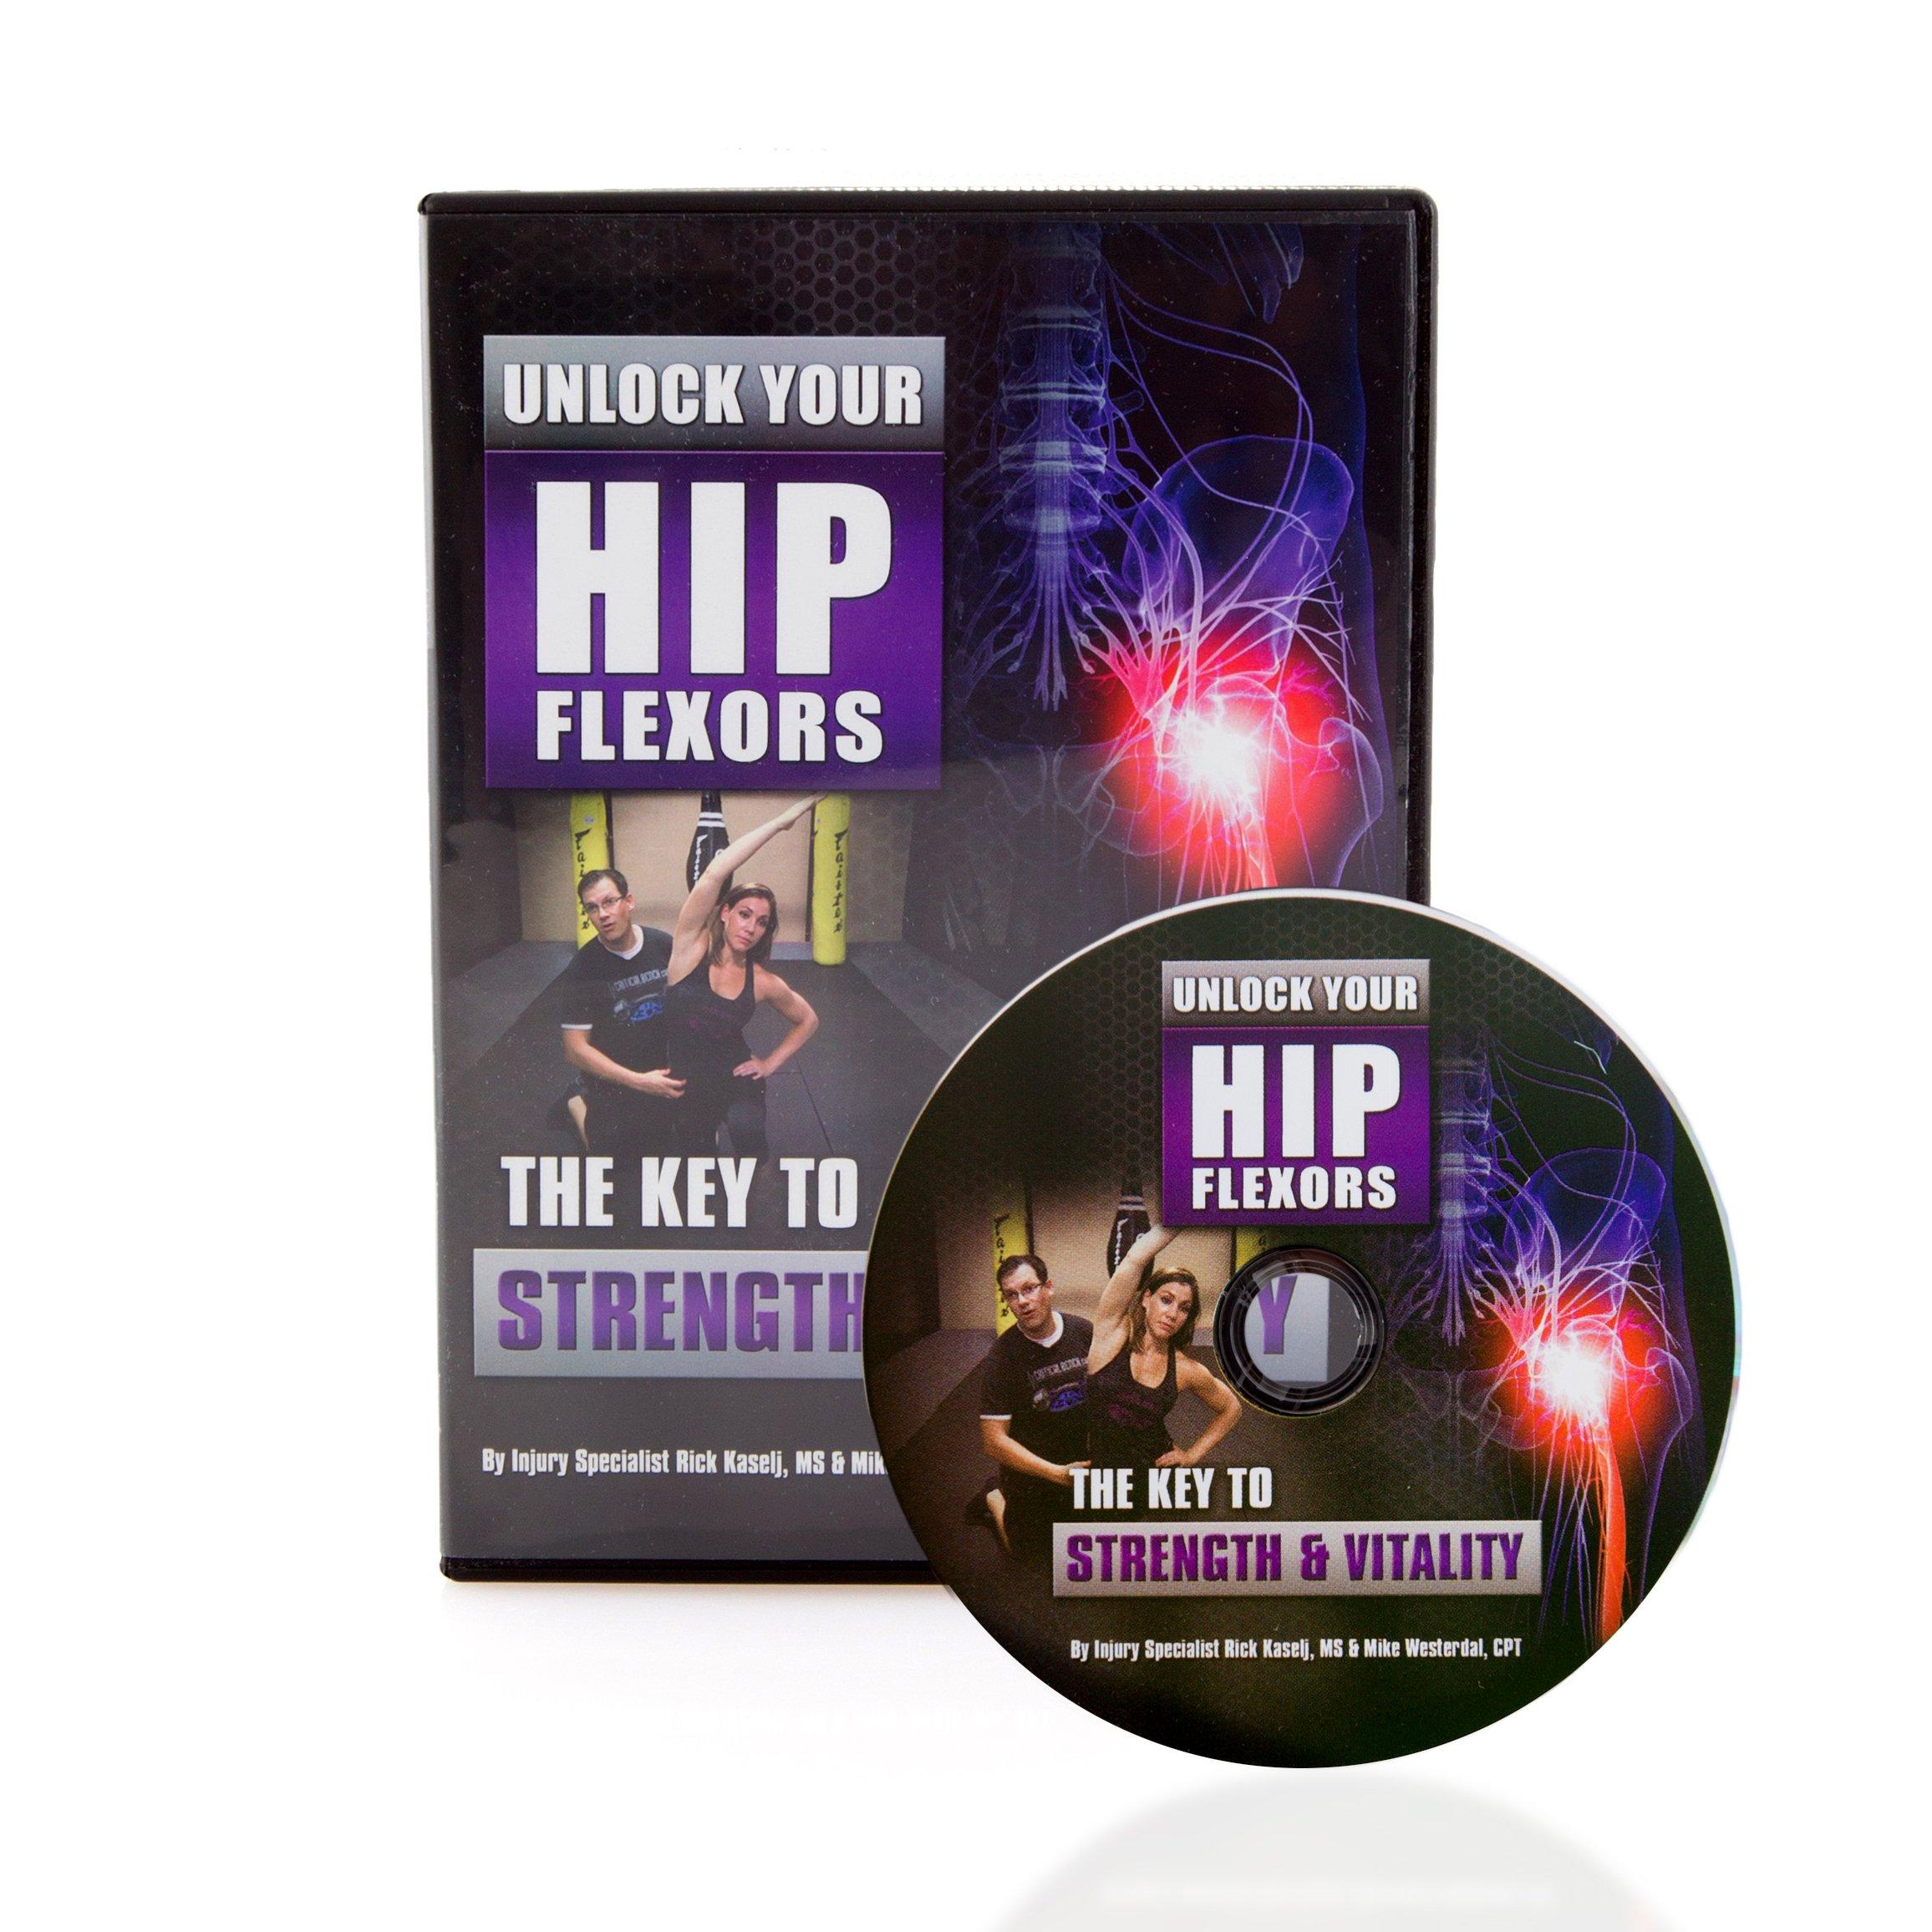 Unlock Your Hip Flexors by ExercisesForInjuries.com (Image #4)